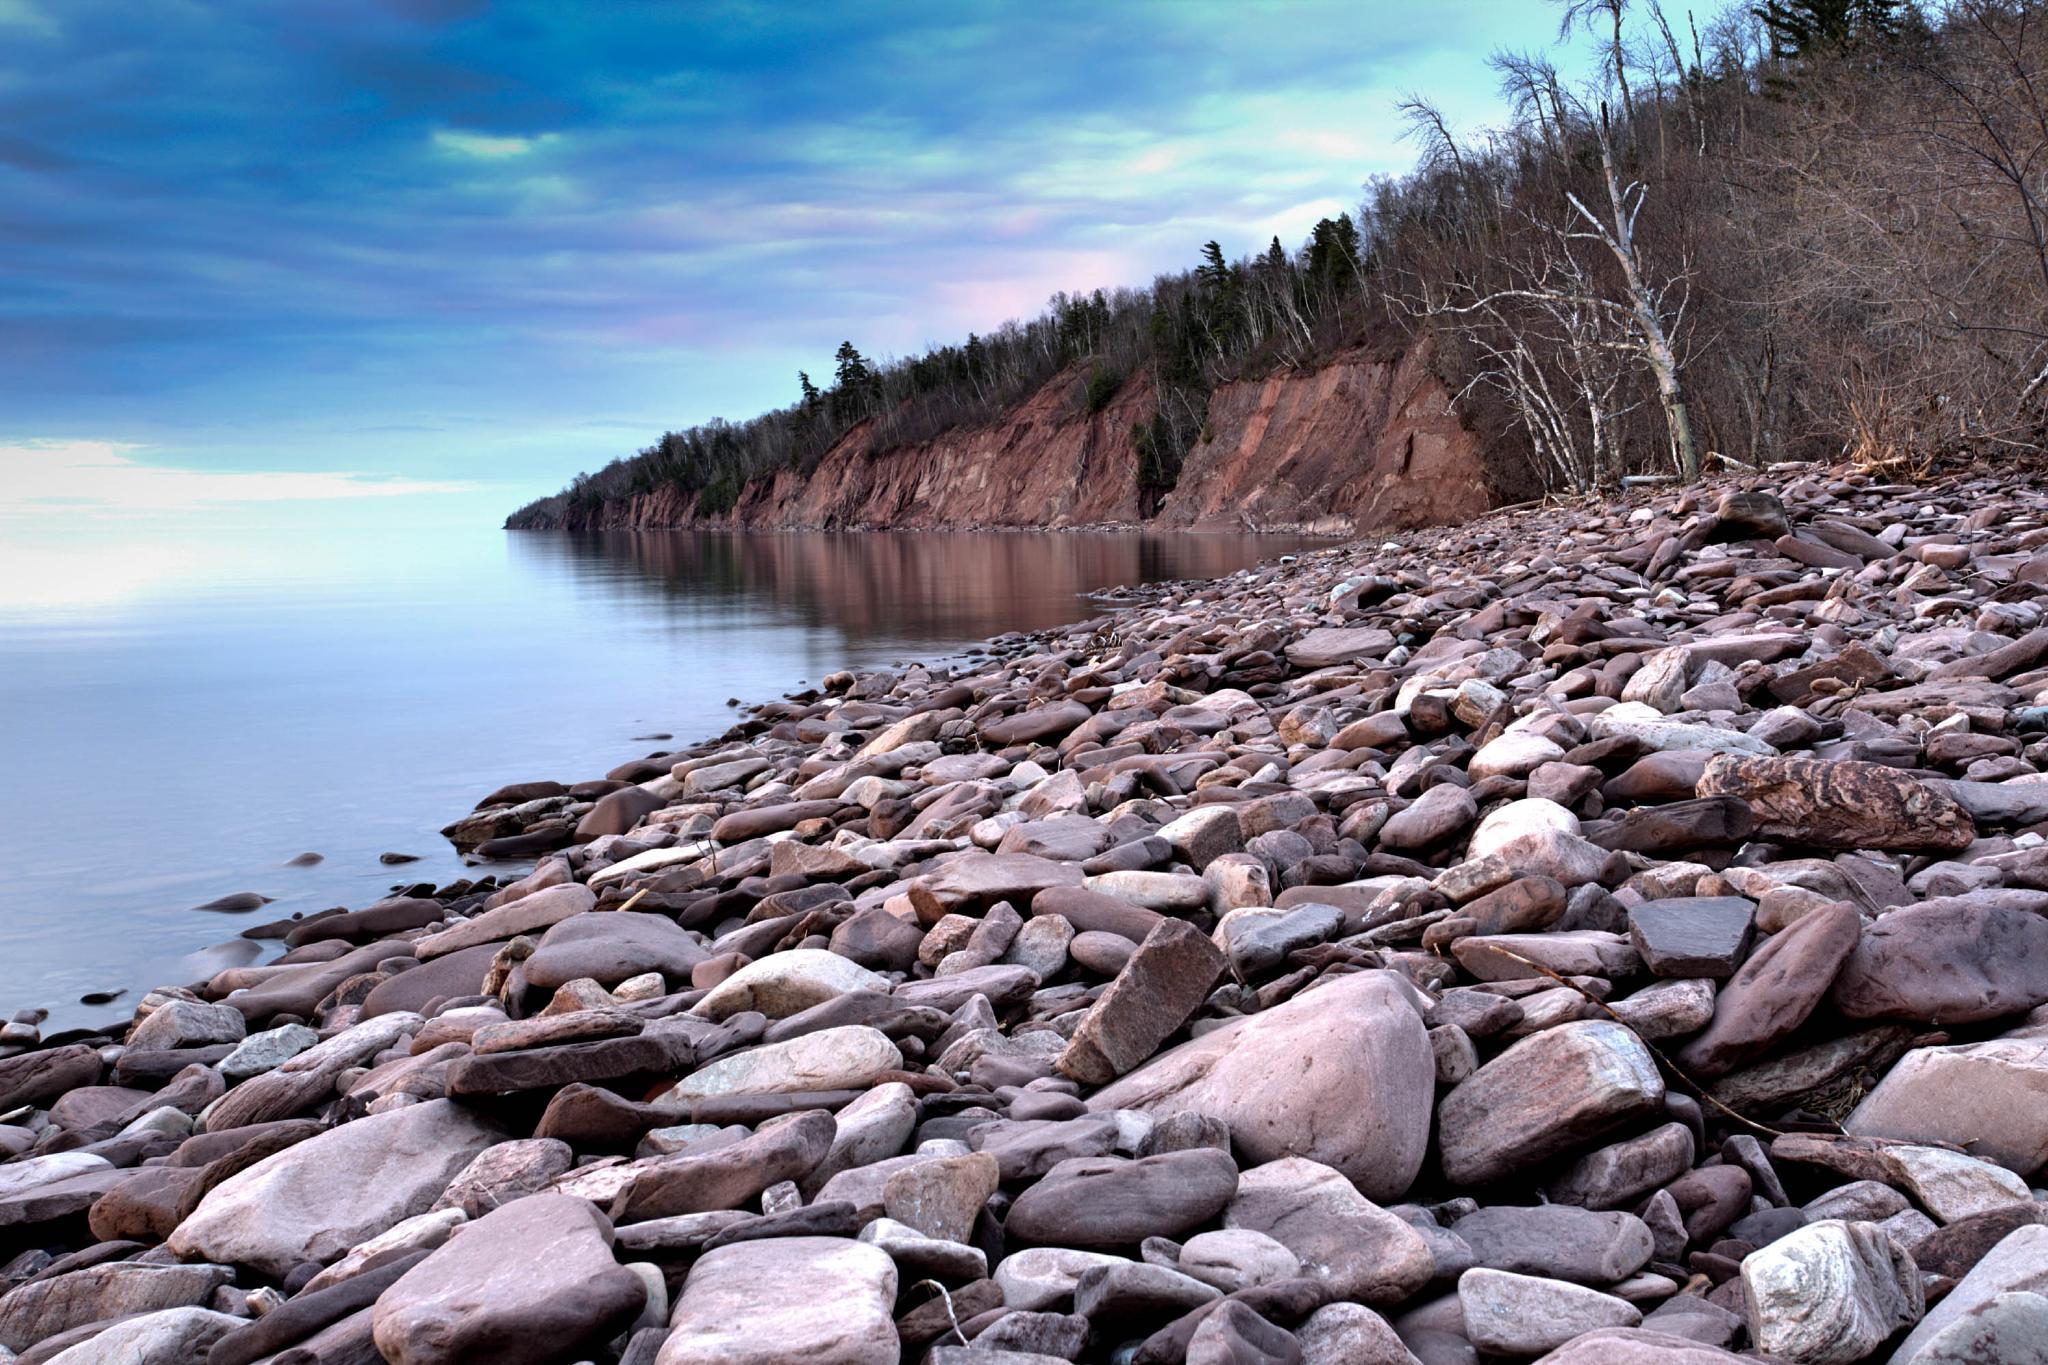 Superior Shoreline by Bertheaume